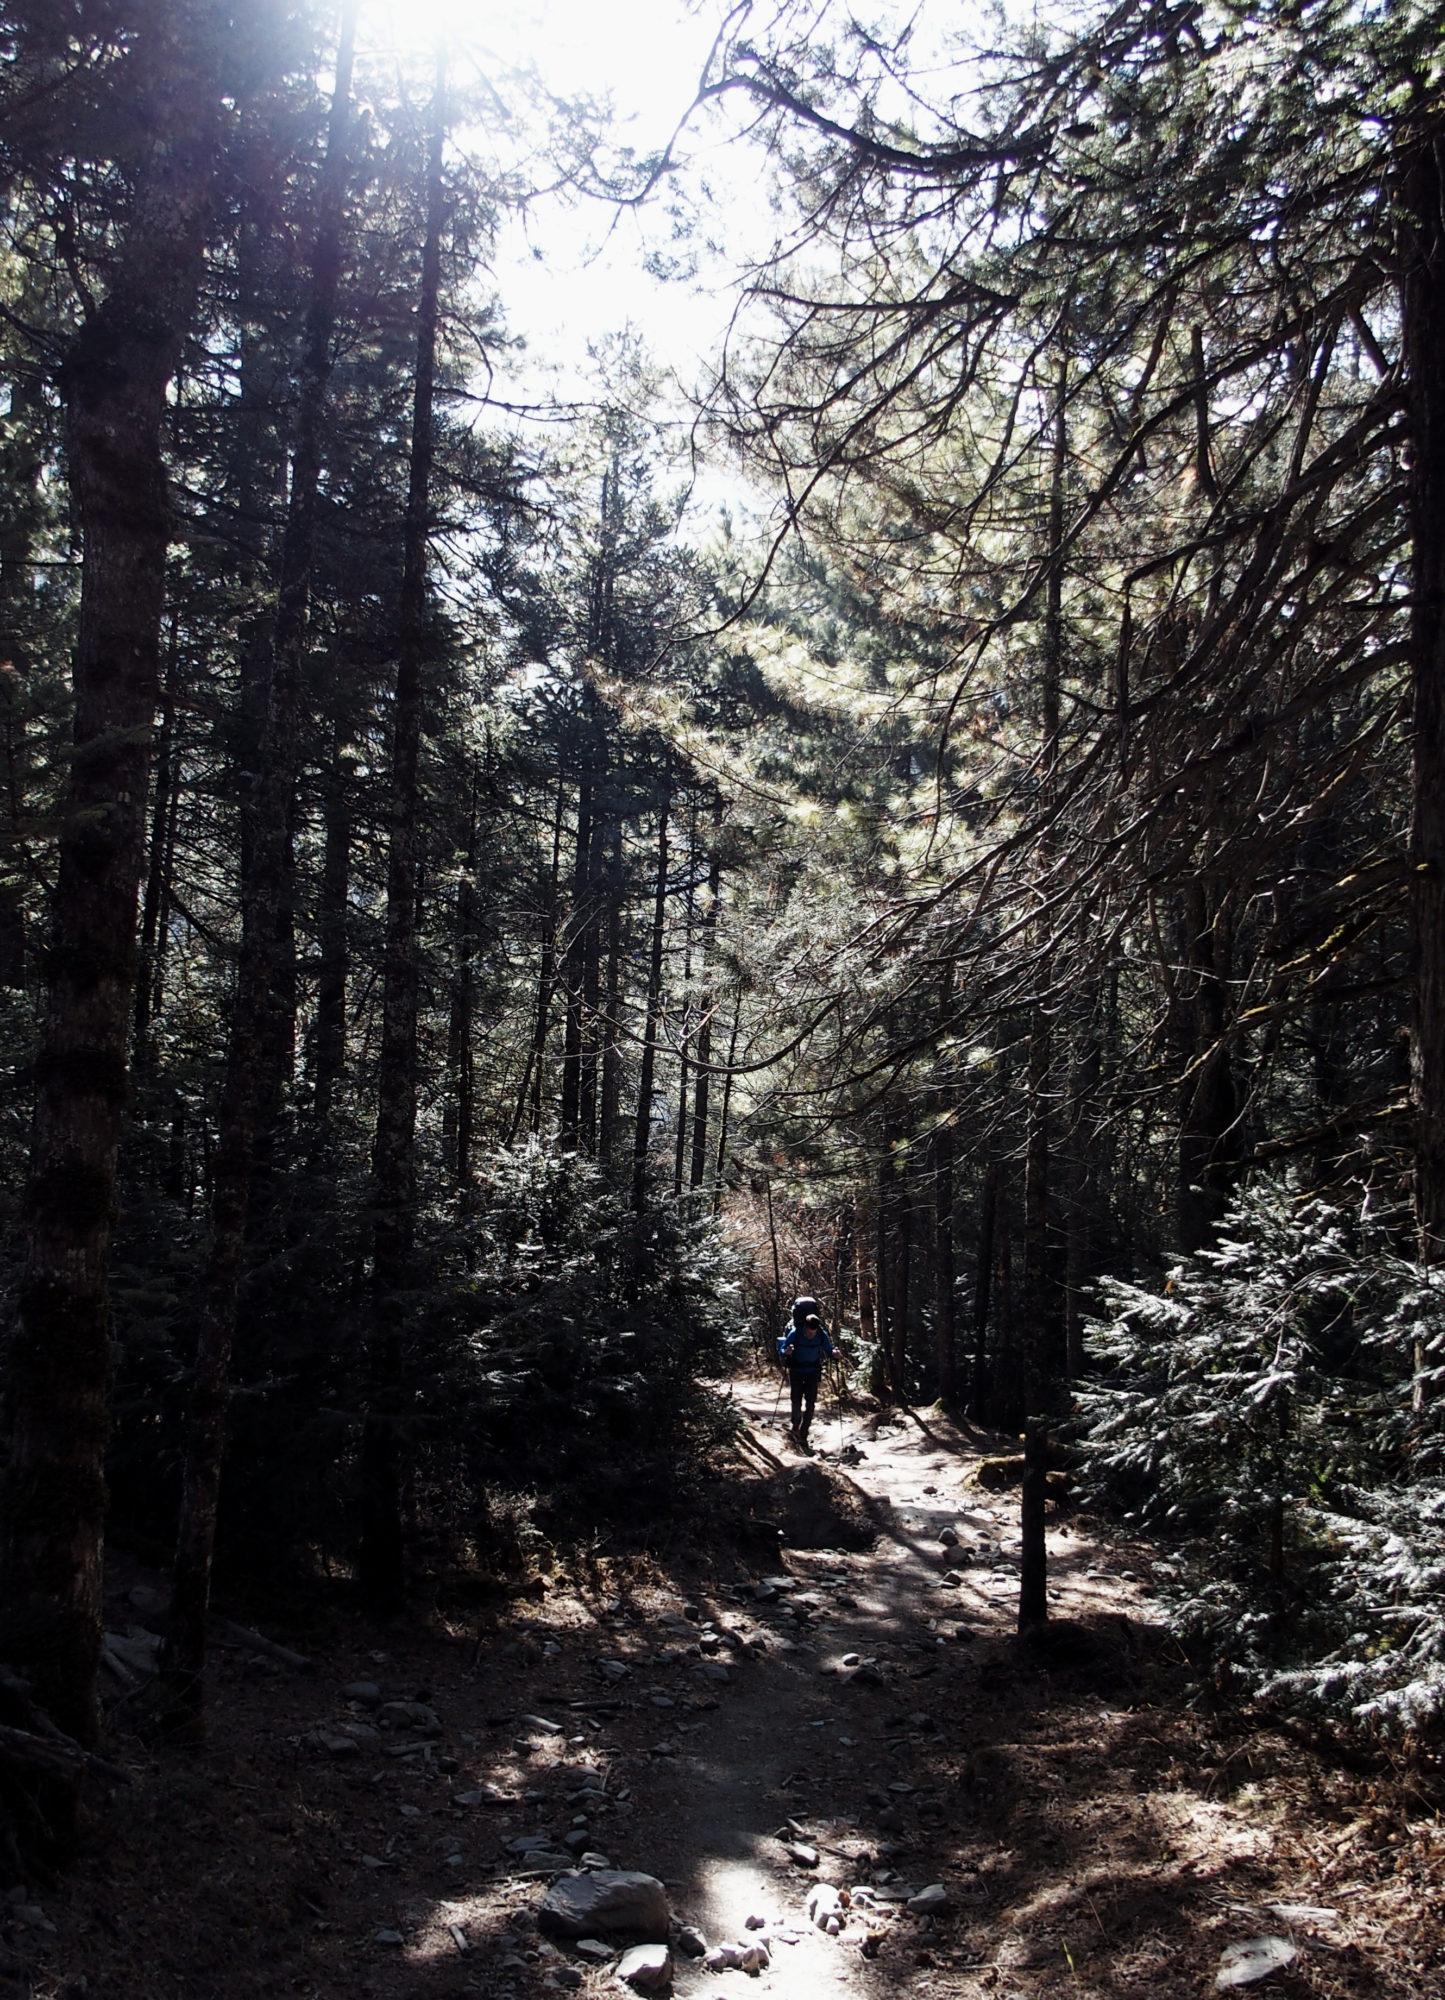 Sonnendurchfluteter Wald